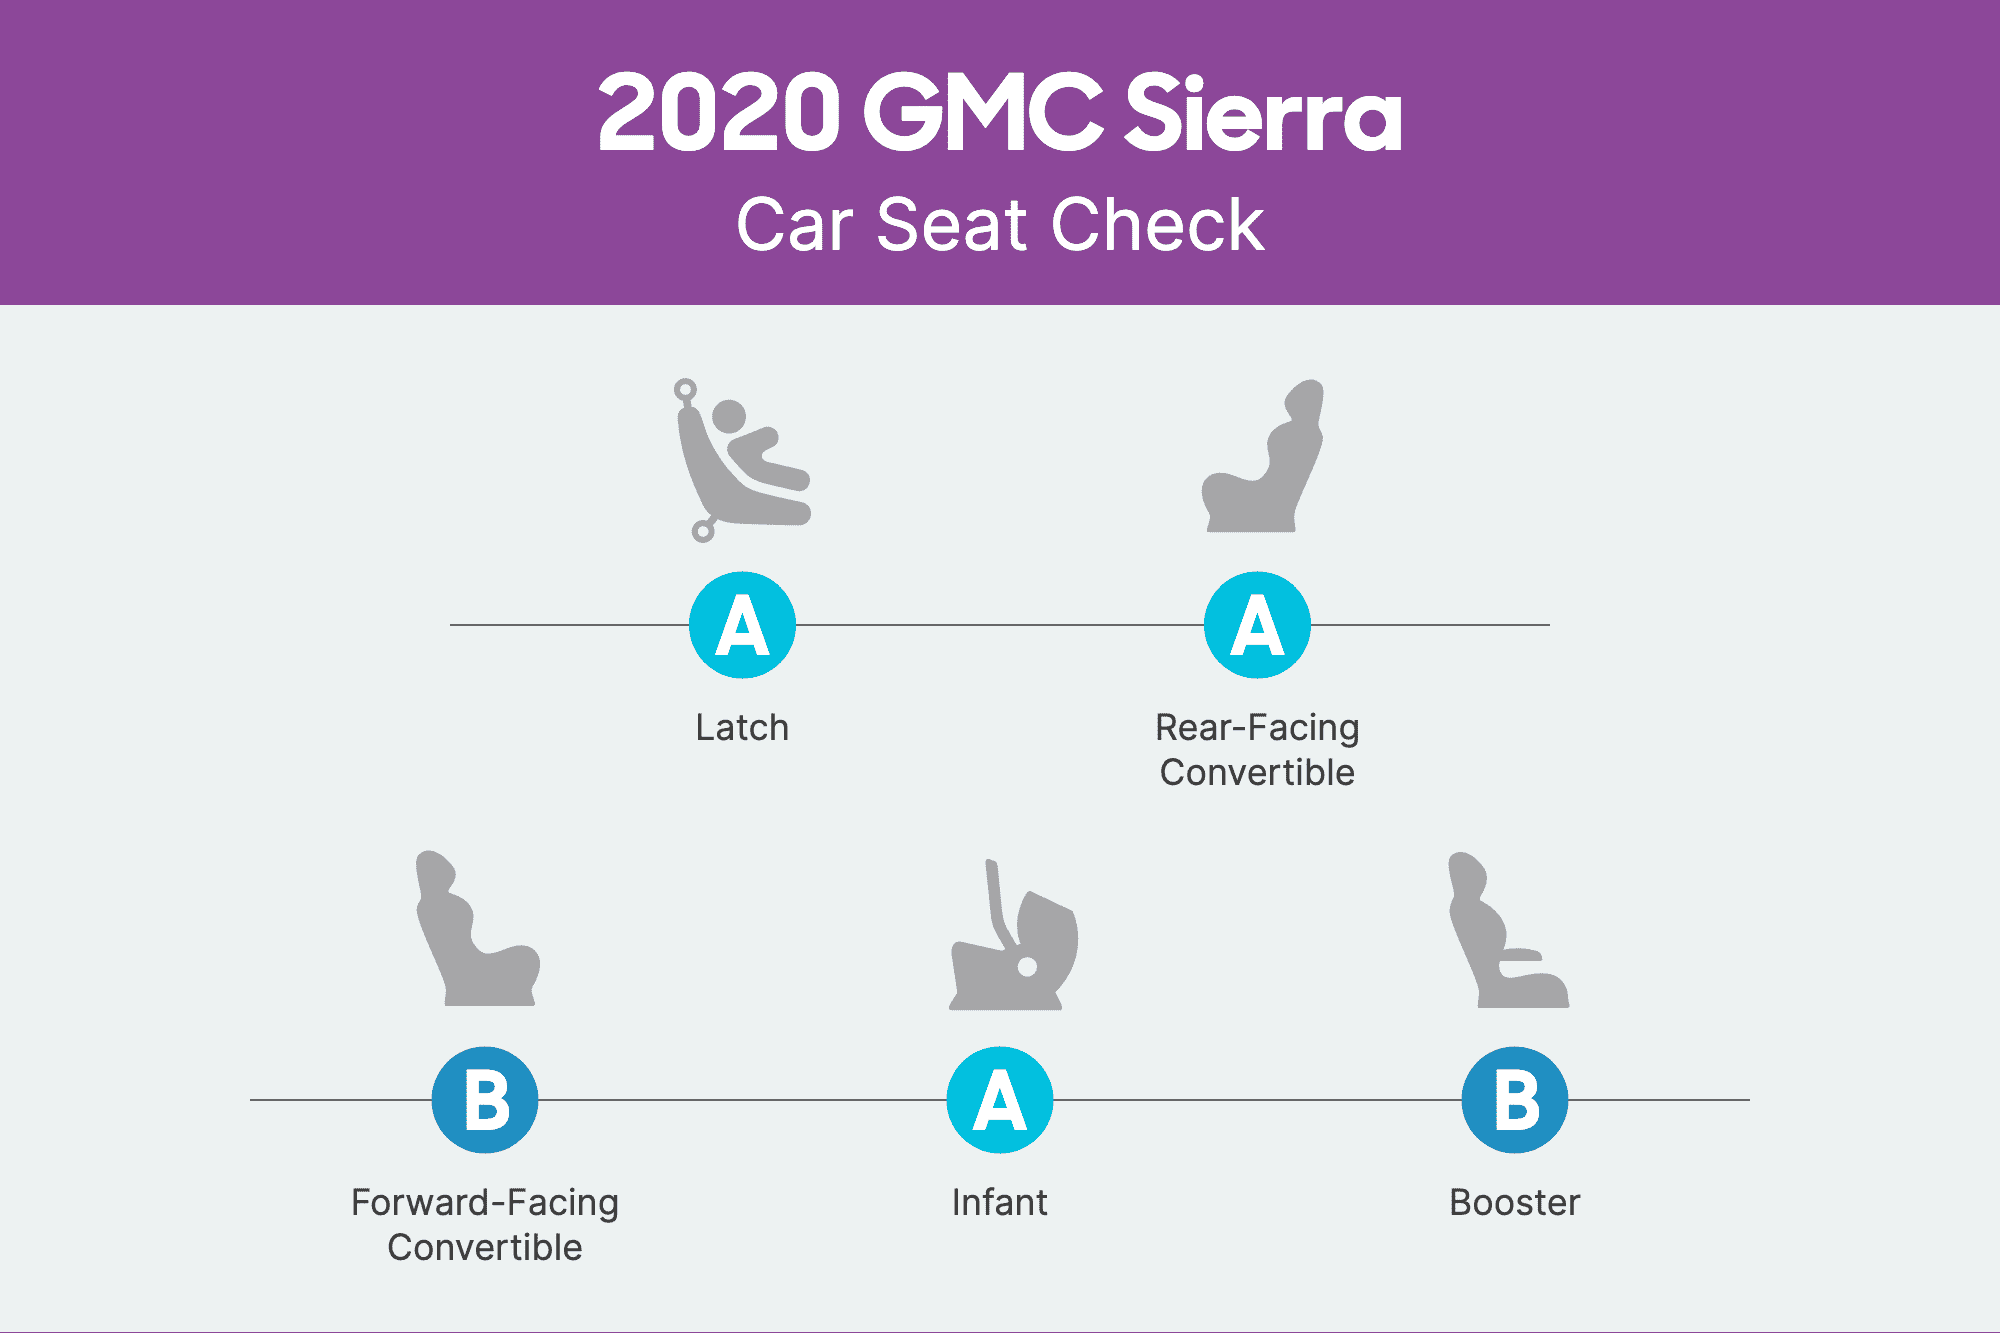 How Do Car Seats Fit in a 2020 GMC Sierra 1500?